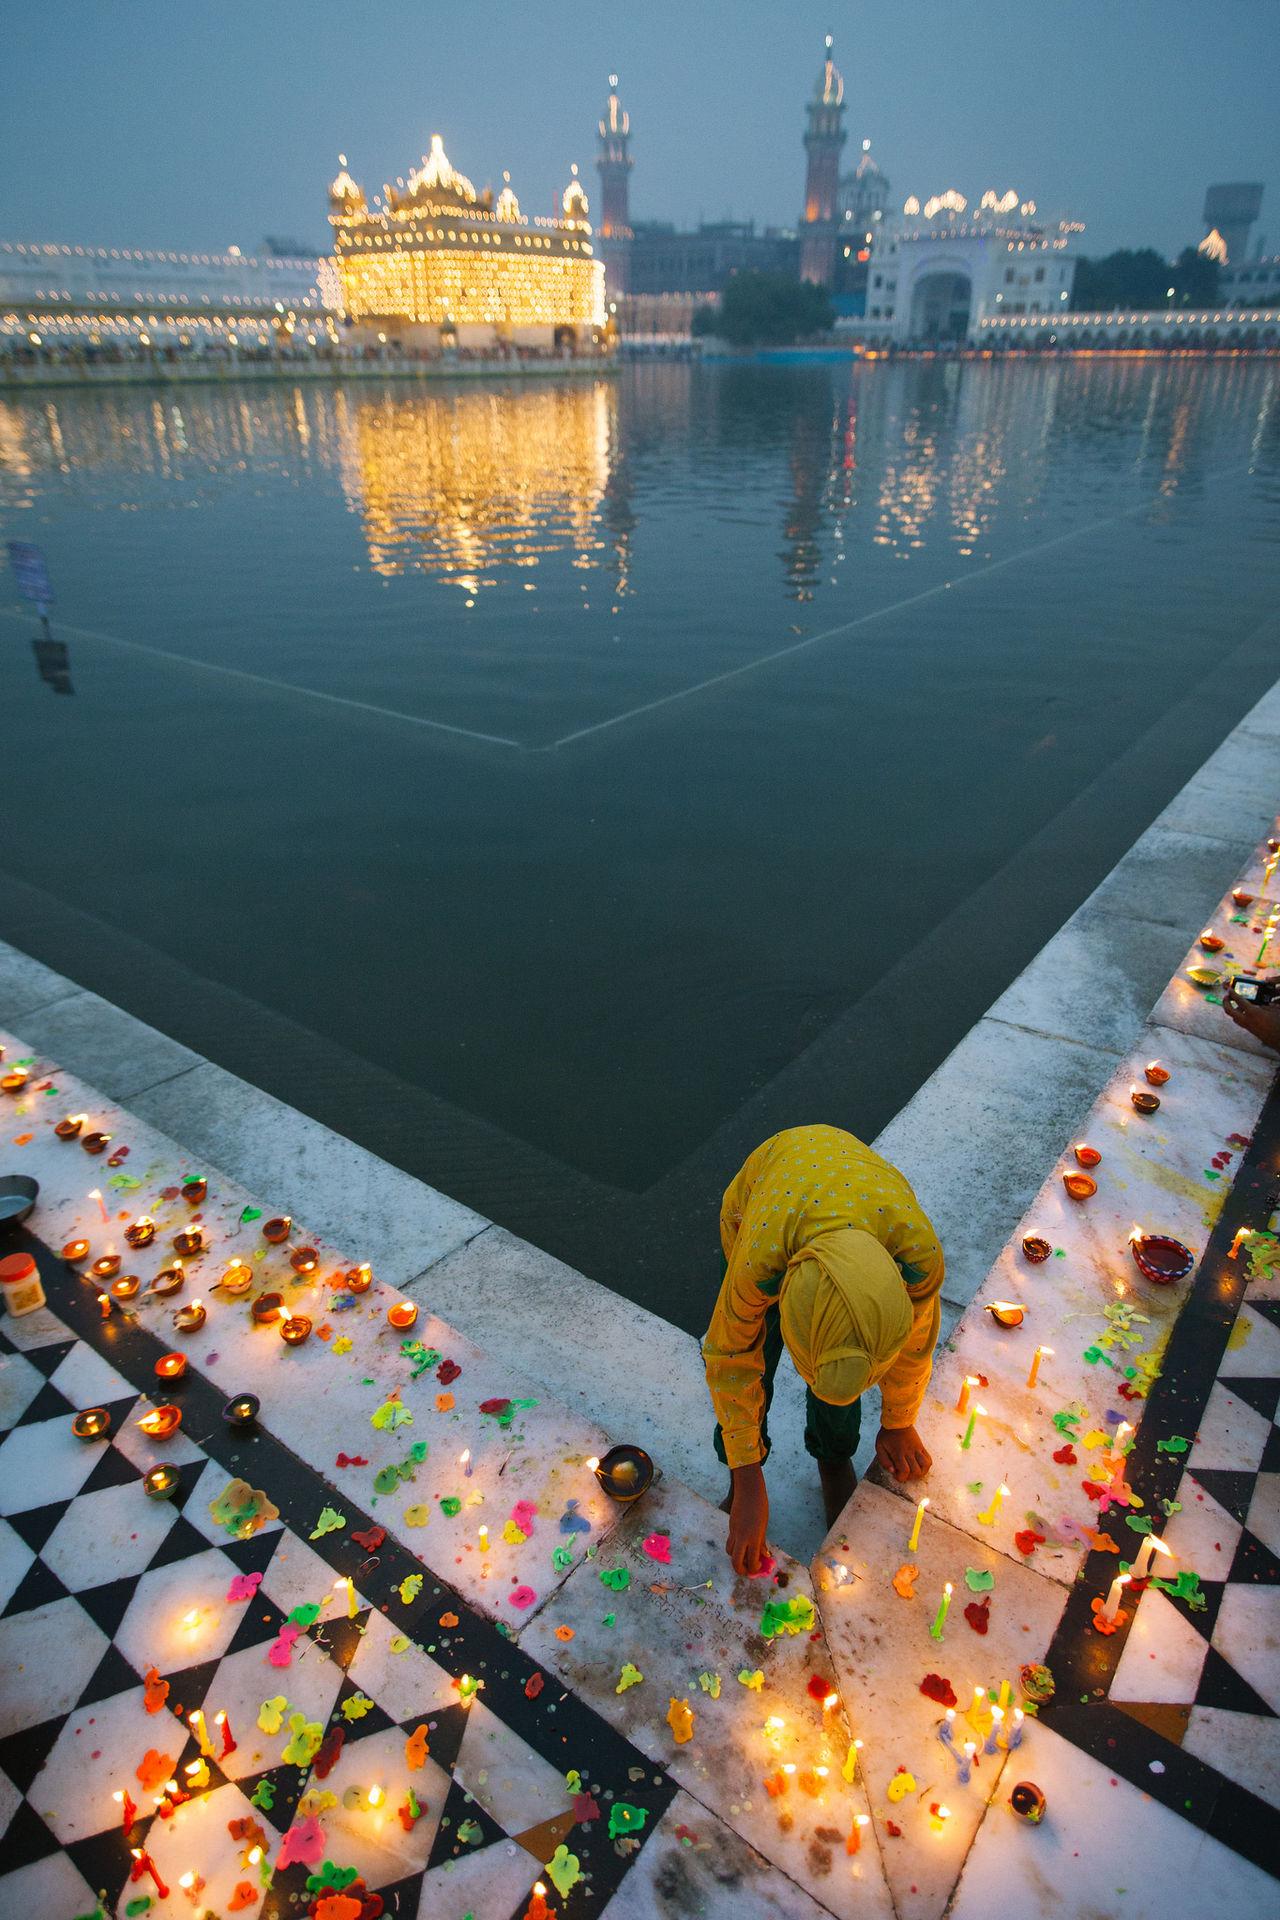 Water Architecture Outdoors Night Diwali Pool India Indian Sikhism Gurudwara Golden Temple Punjab Amritsar Built Structure Gold Temple Candle Light Kid